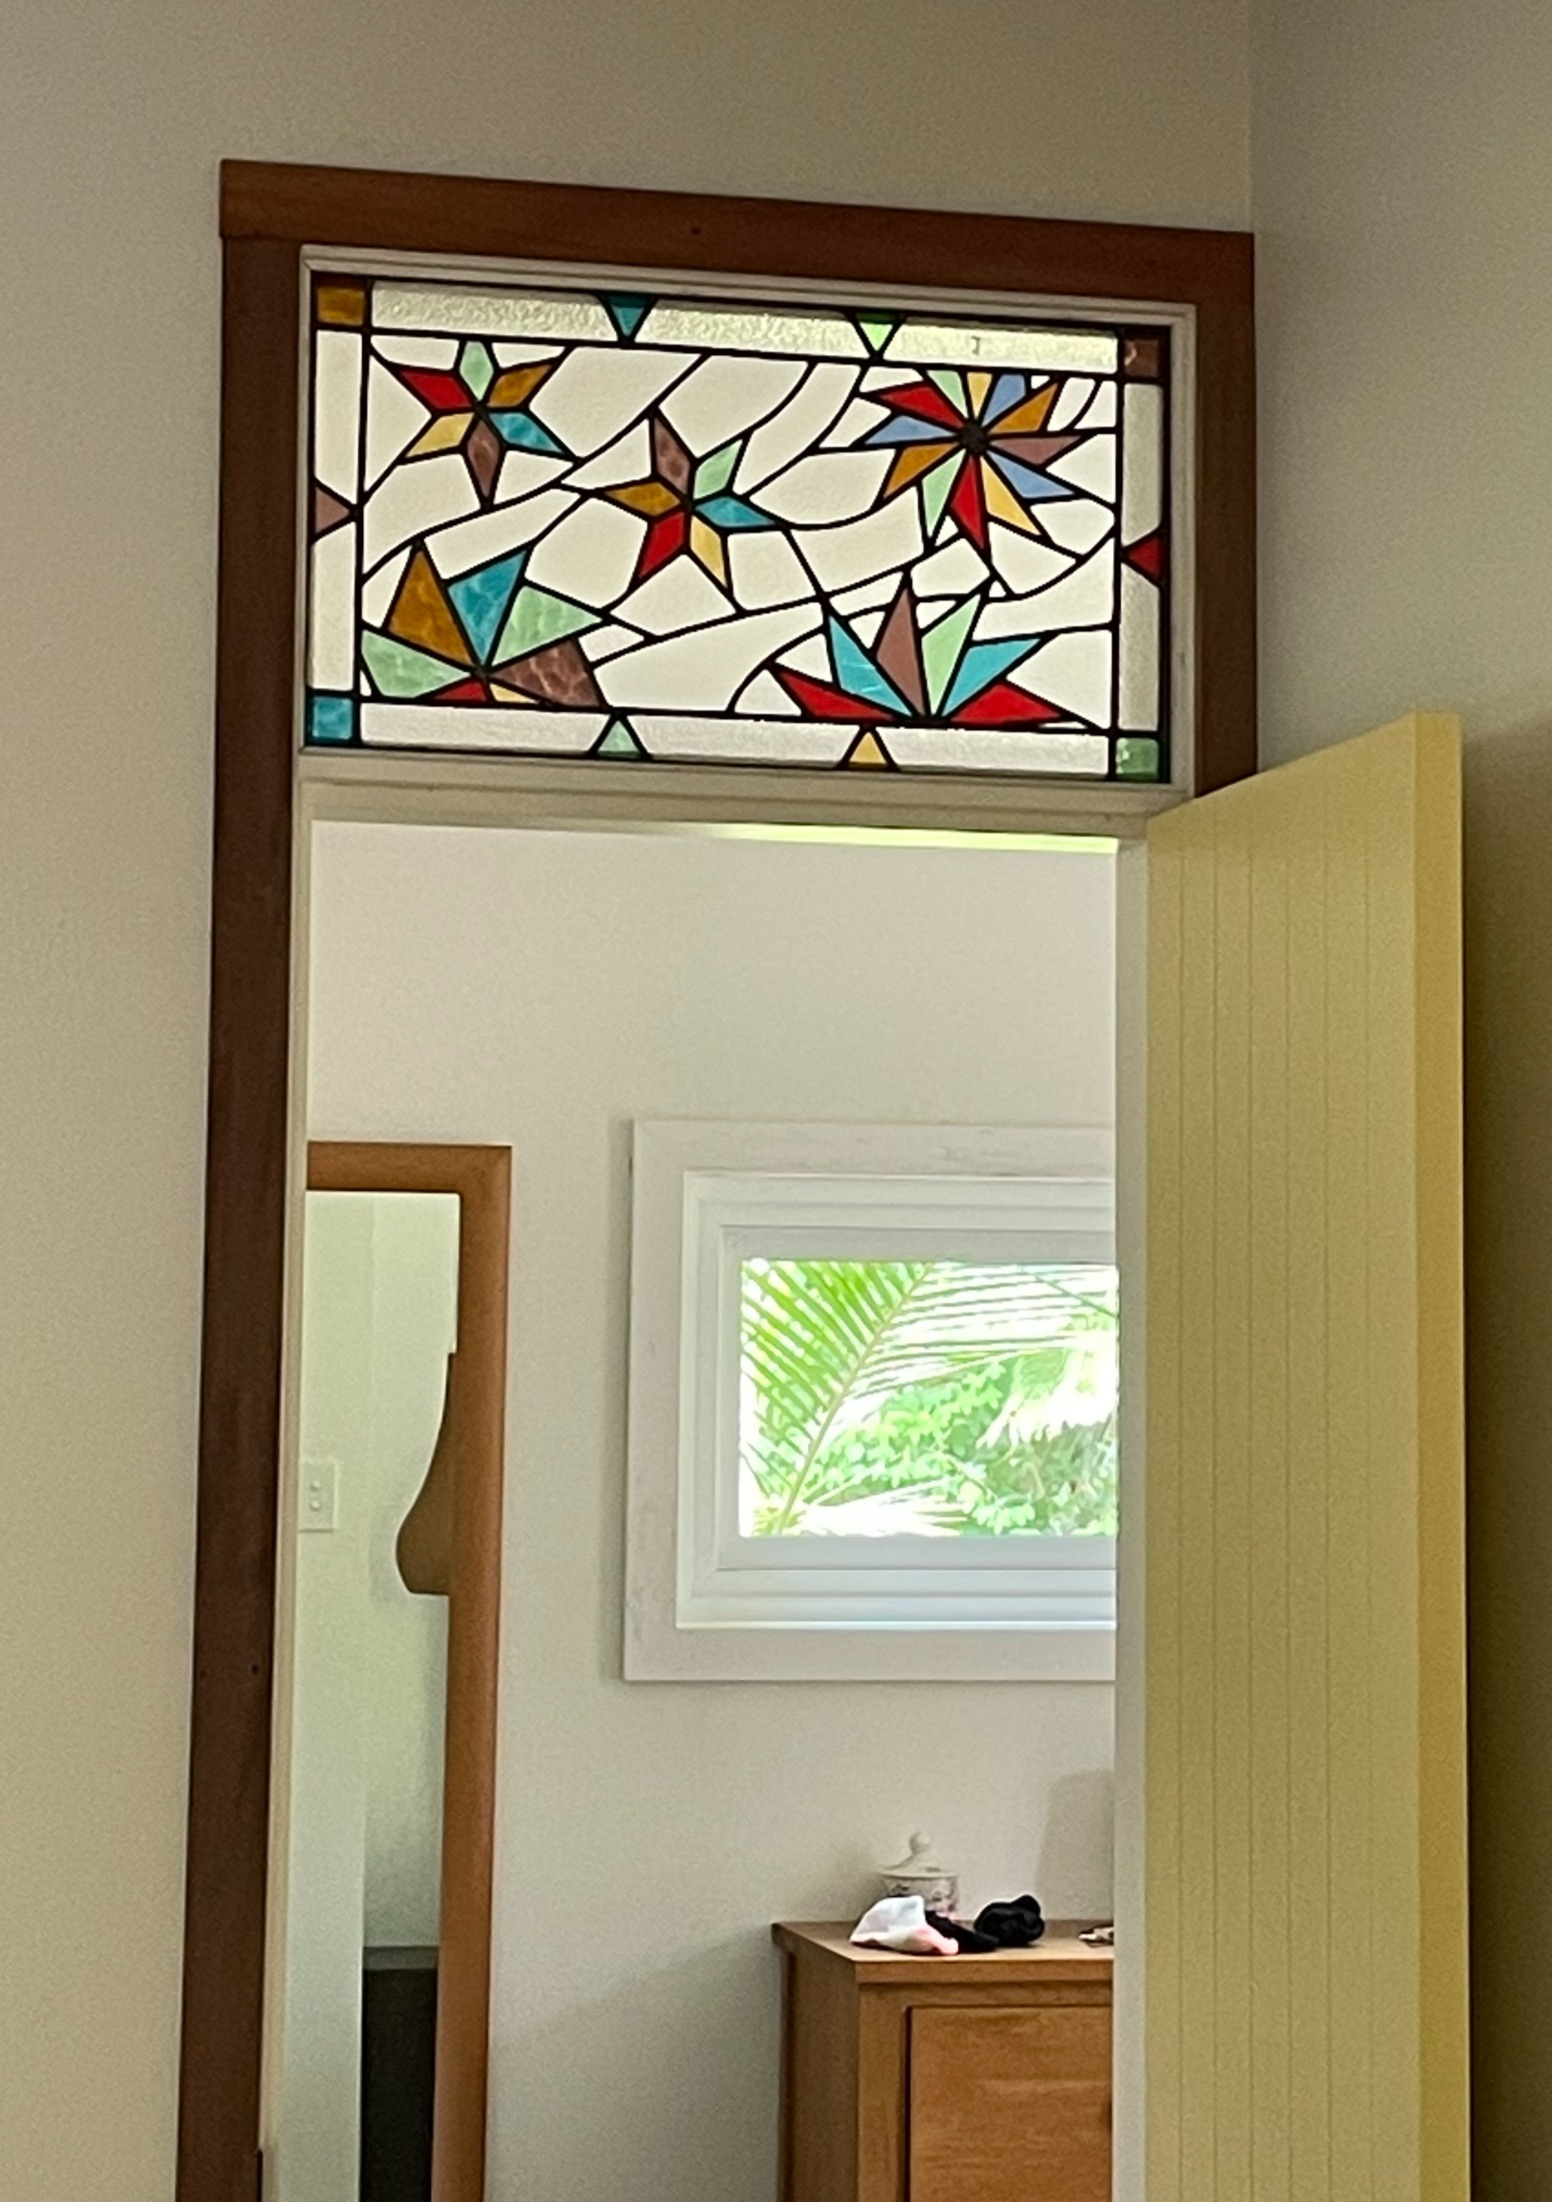 Transom windows Mullumbimby 2020